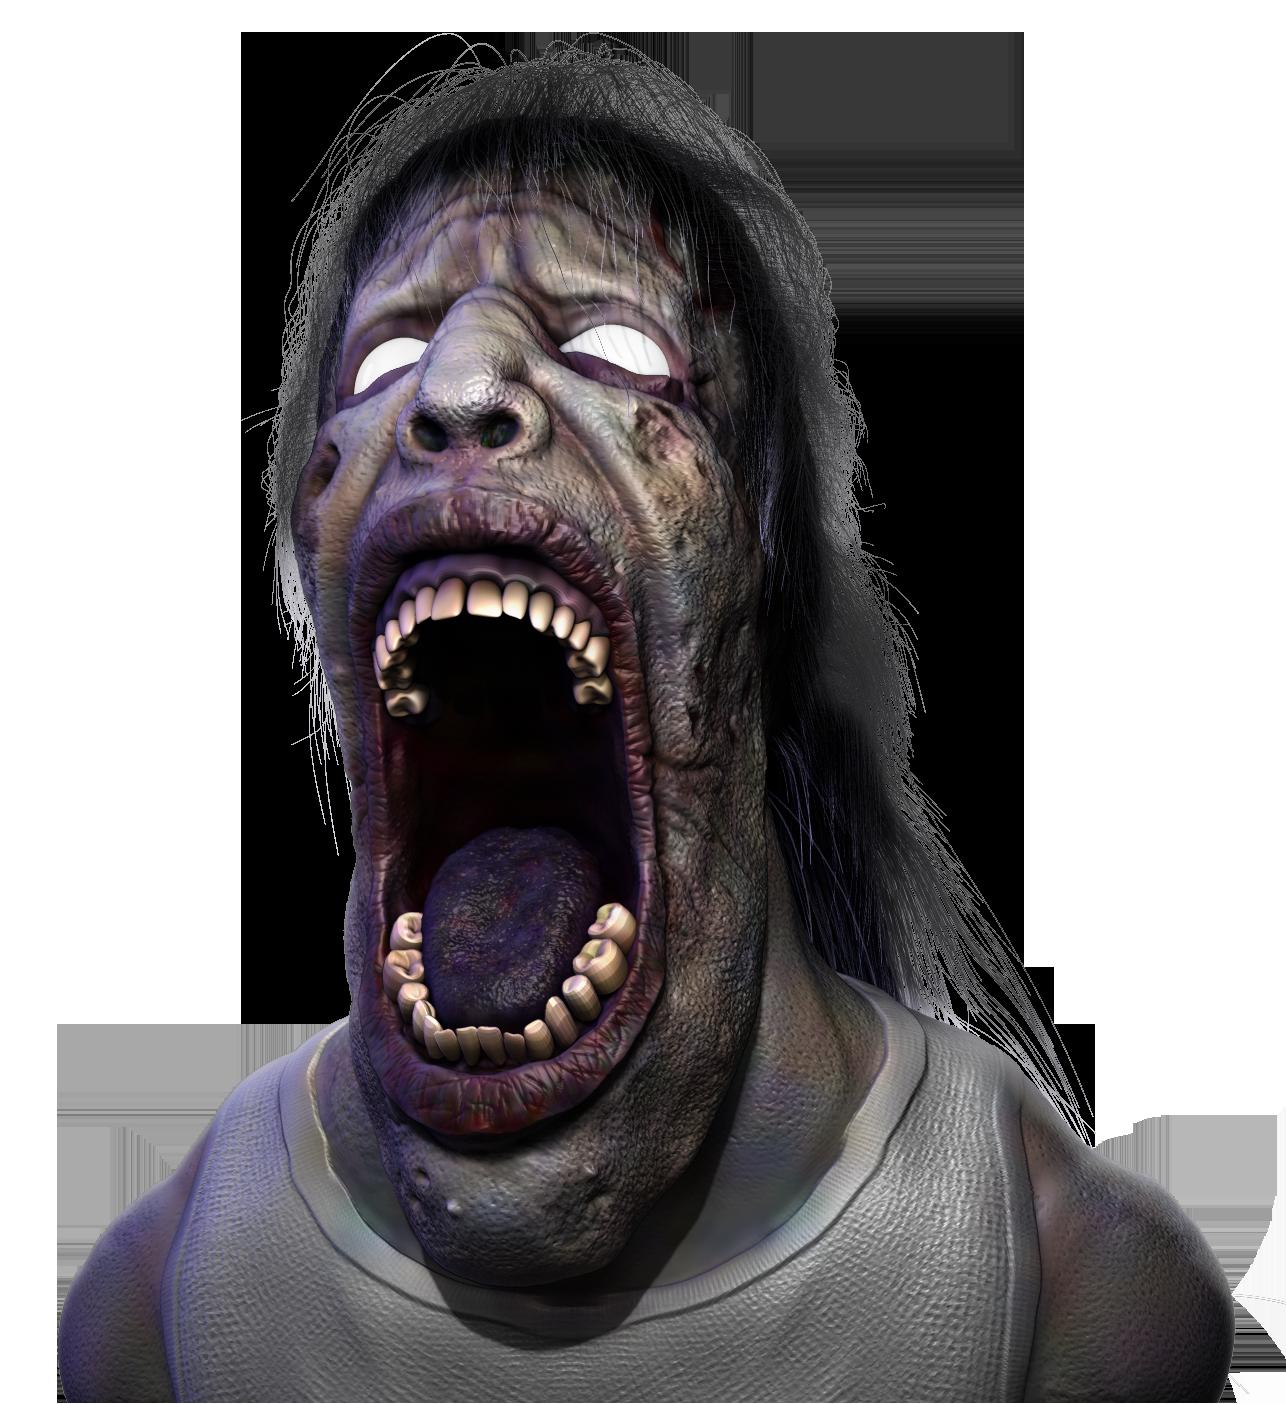 Zombie_scream2lrg.png